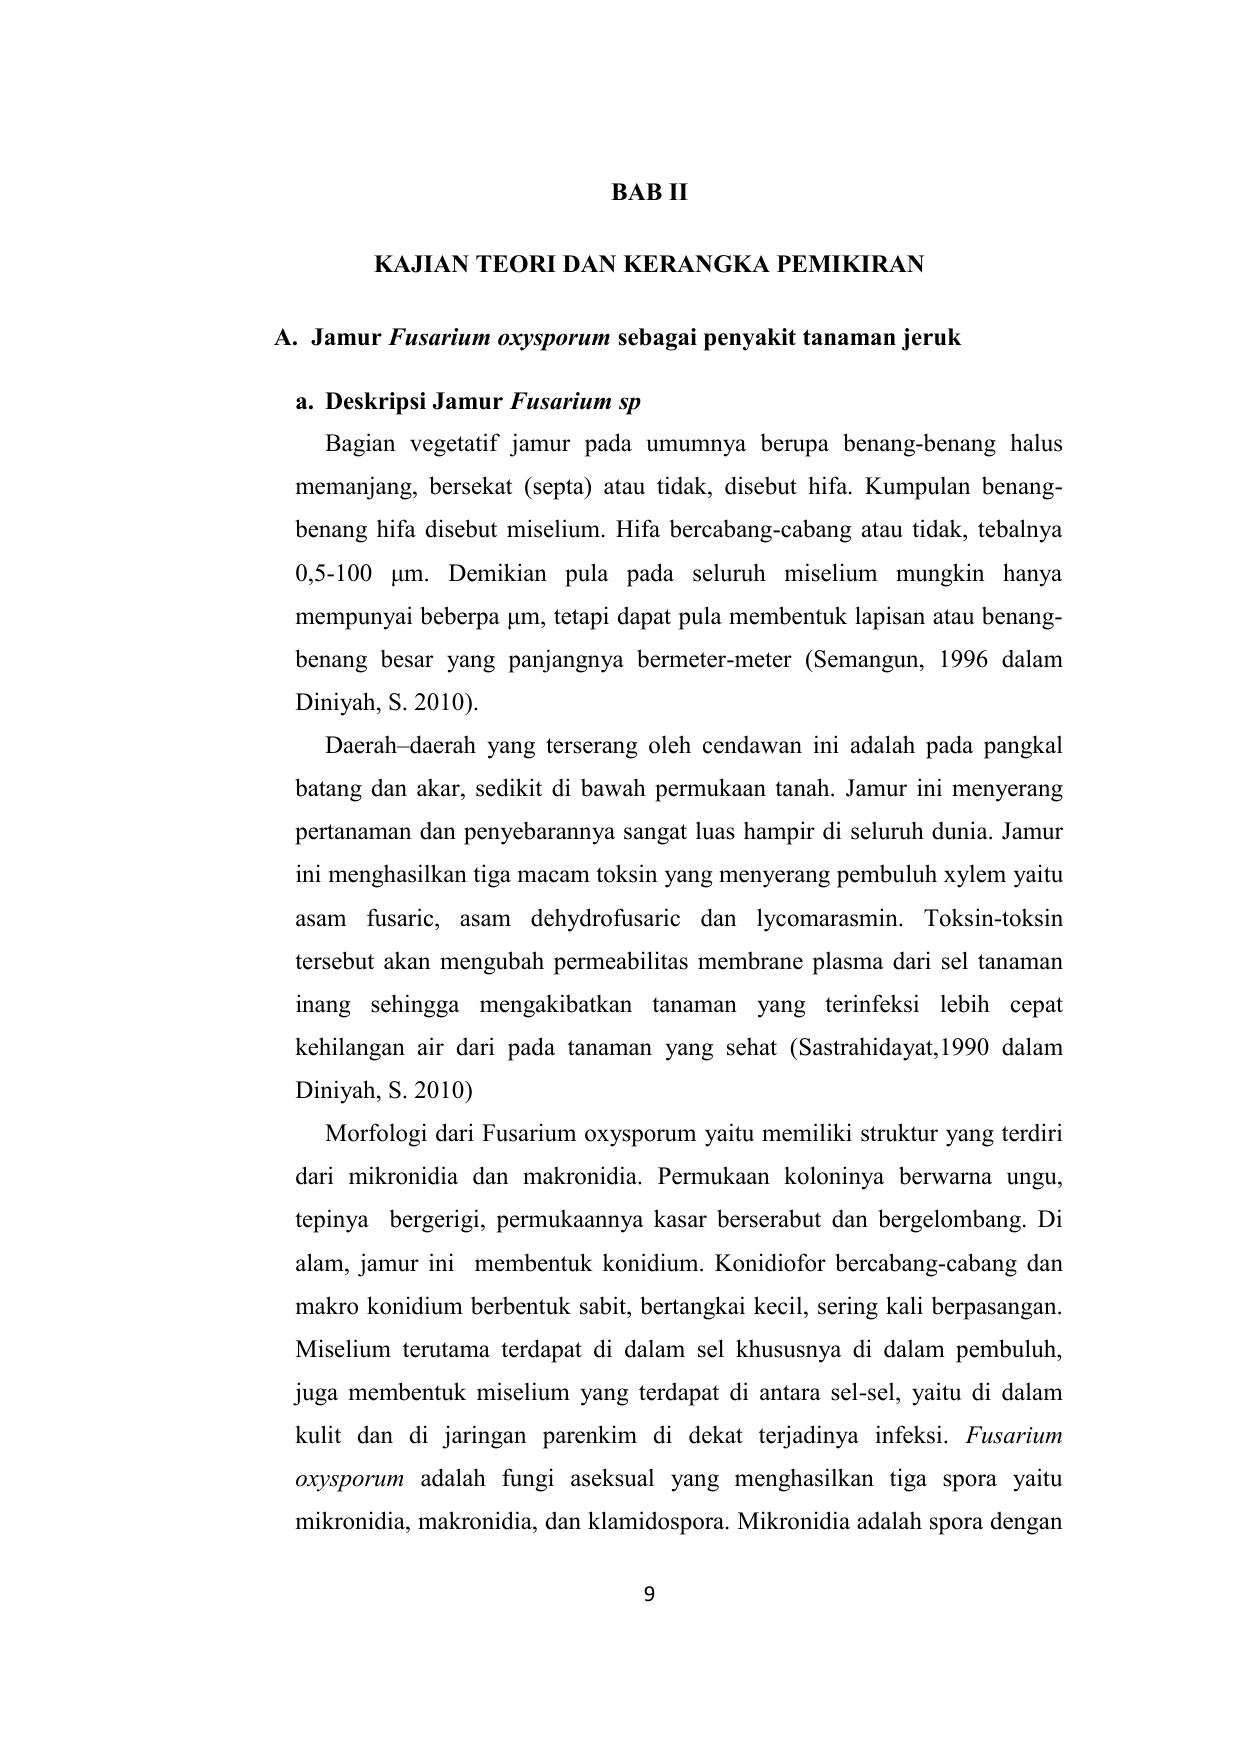 Contoh Kerangka Pemikiran Proposal Skripsi - Pejuang Skripsi